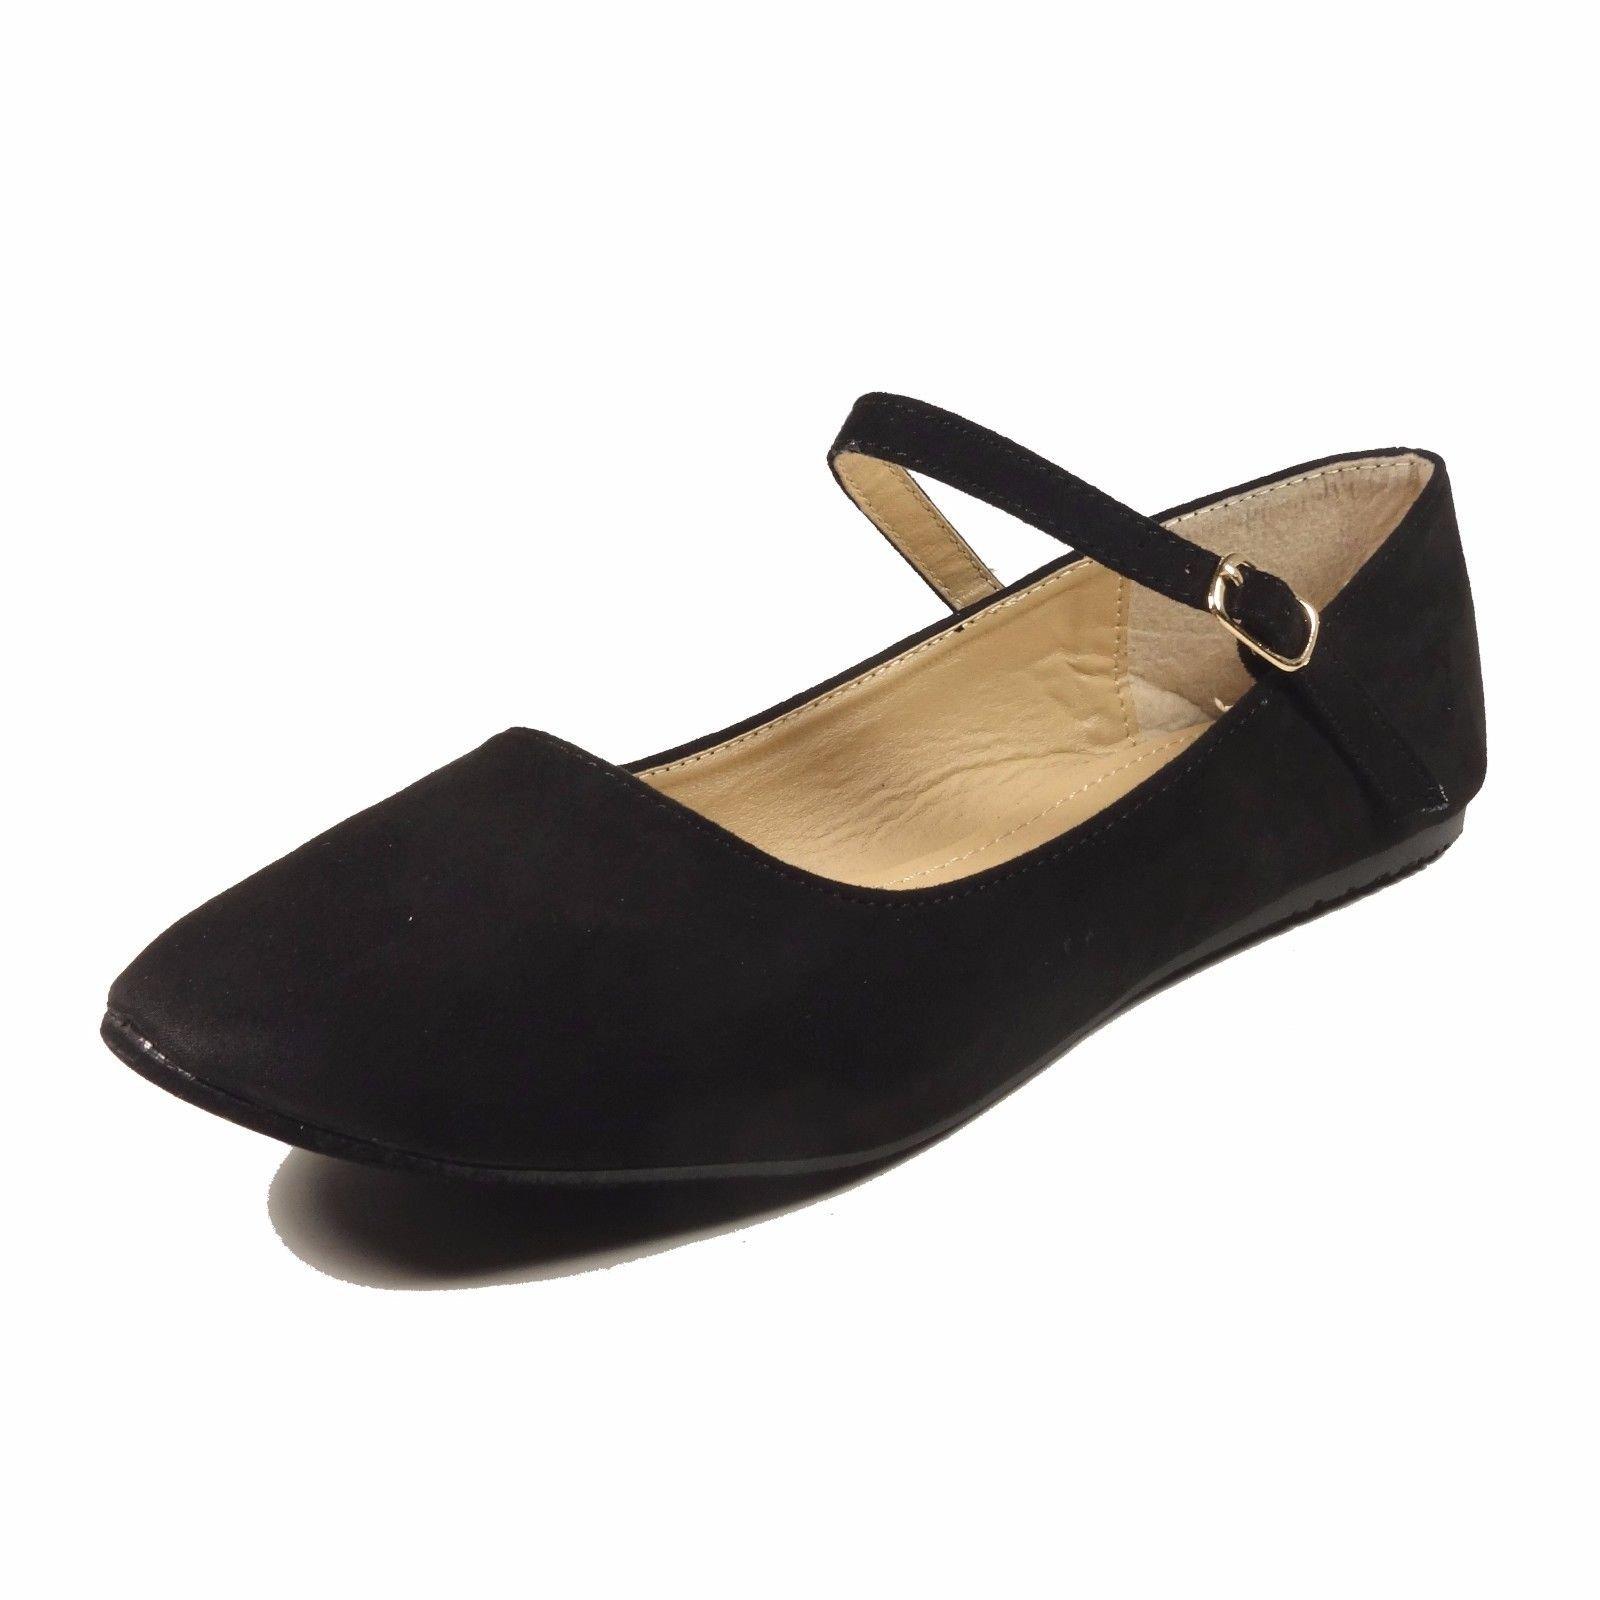 Nova Utopia Women's Mary Jane Style Ballet Flats,NFLA01 MJ BlackSuede 6h